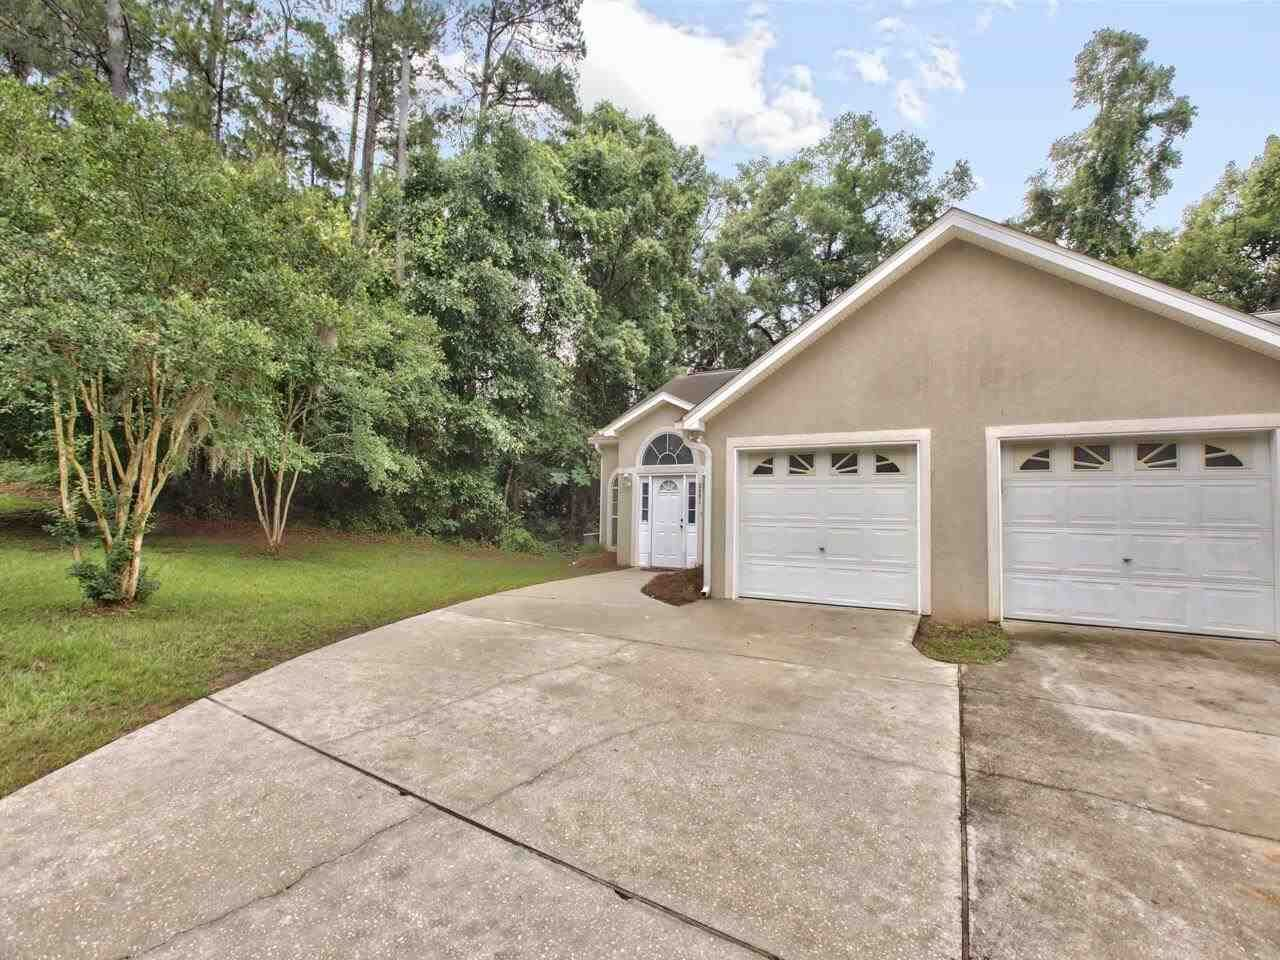 Photo of 3481 Chatelaine Ct, TALLAHASSEE, FL 32308 (MLS # 332282)